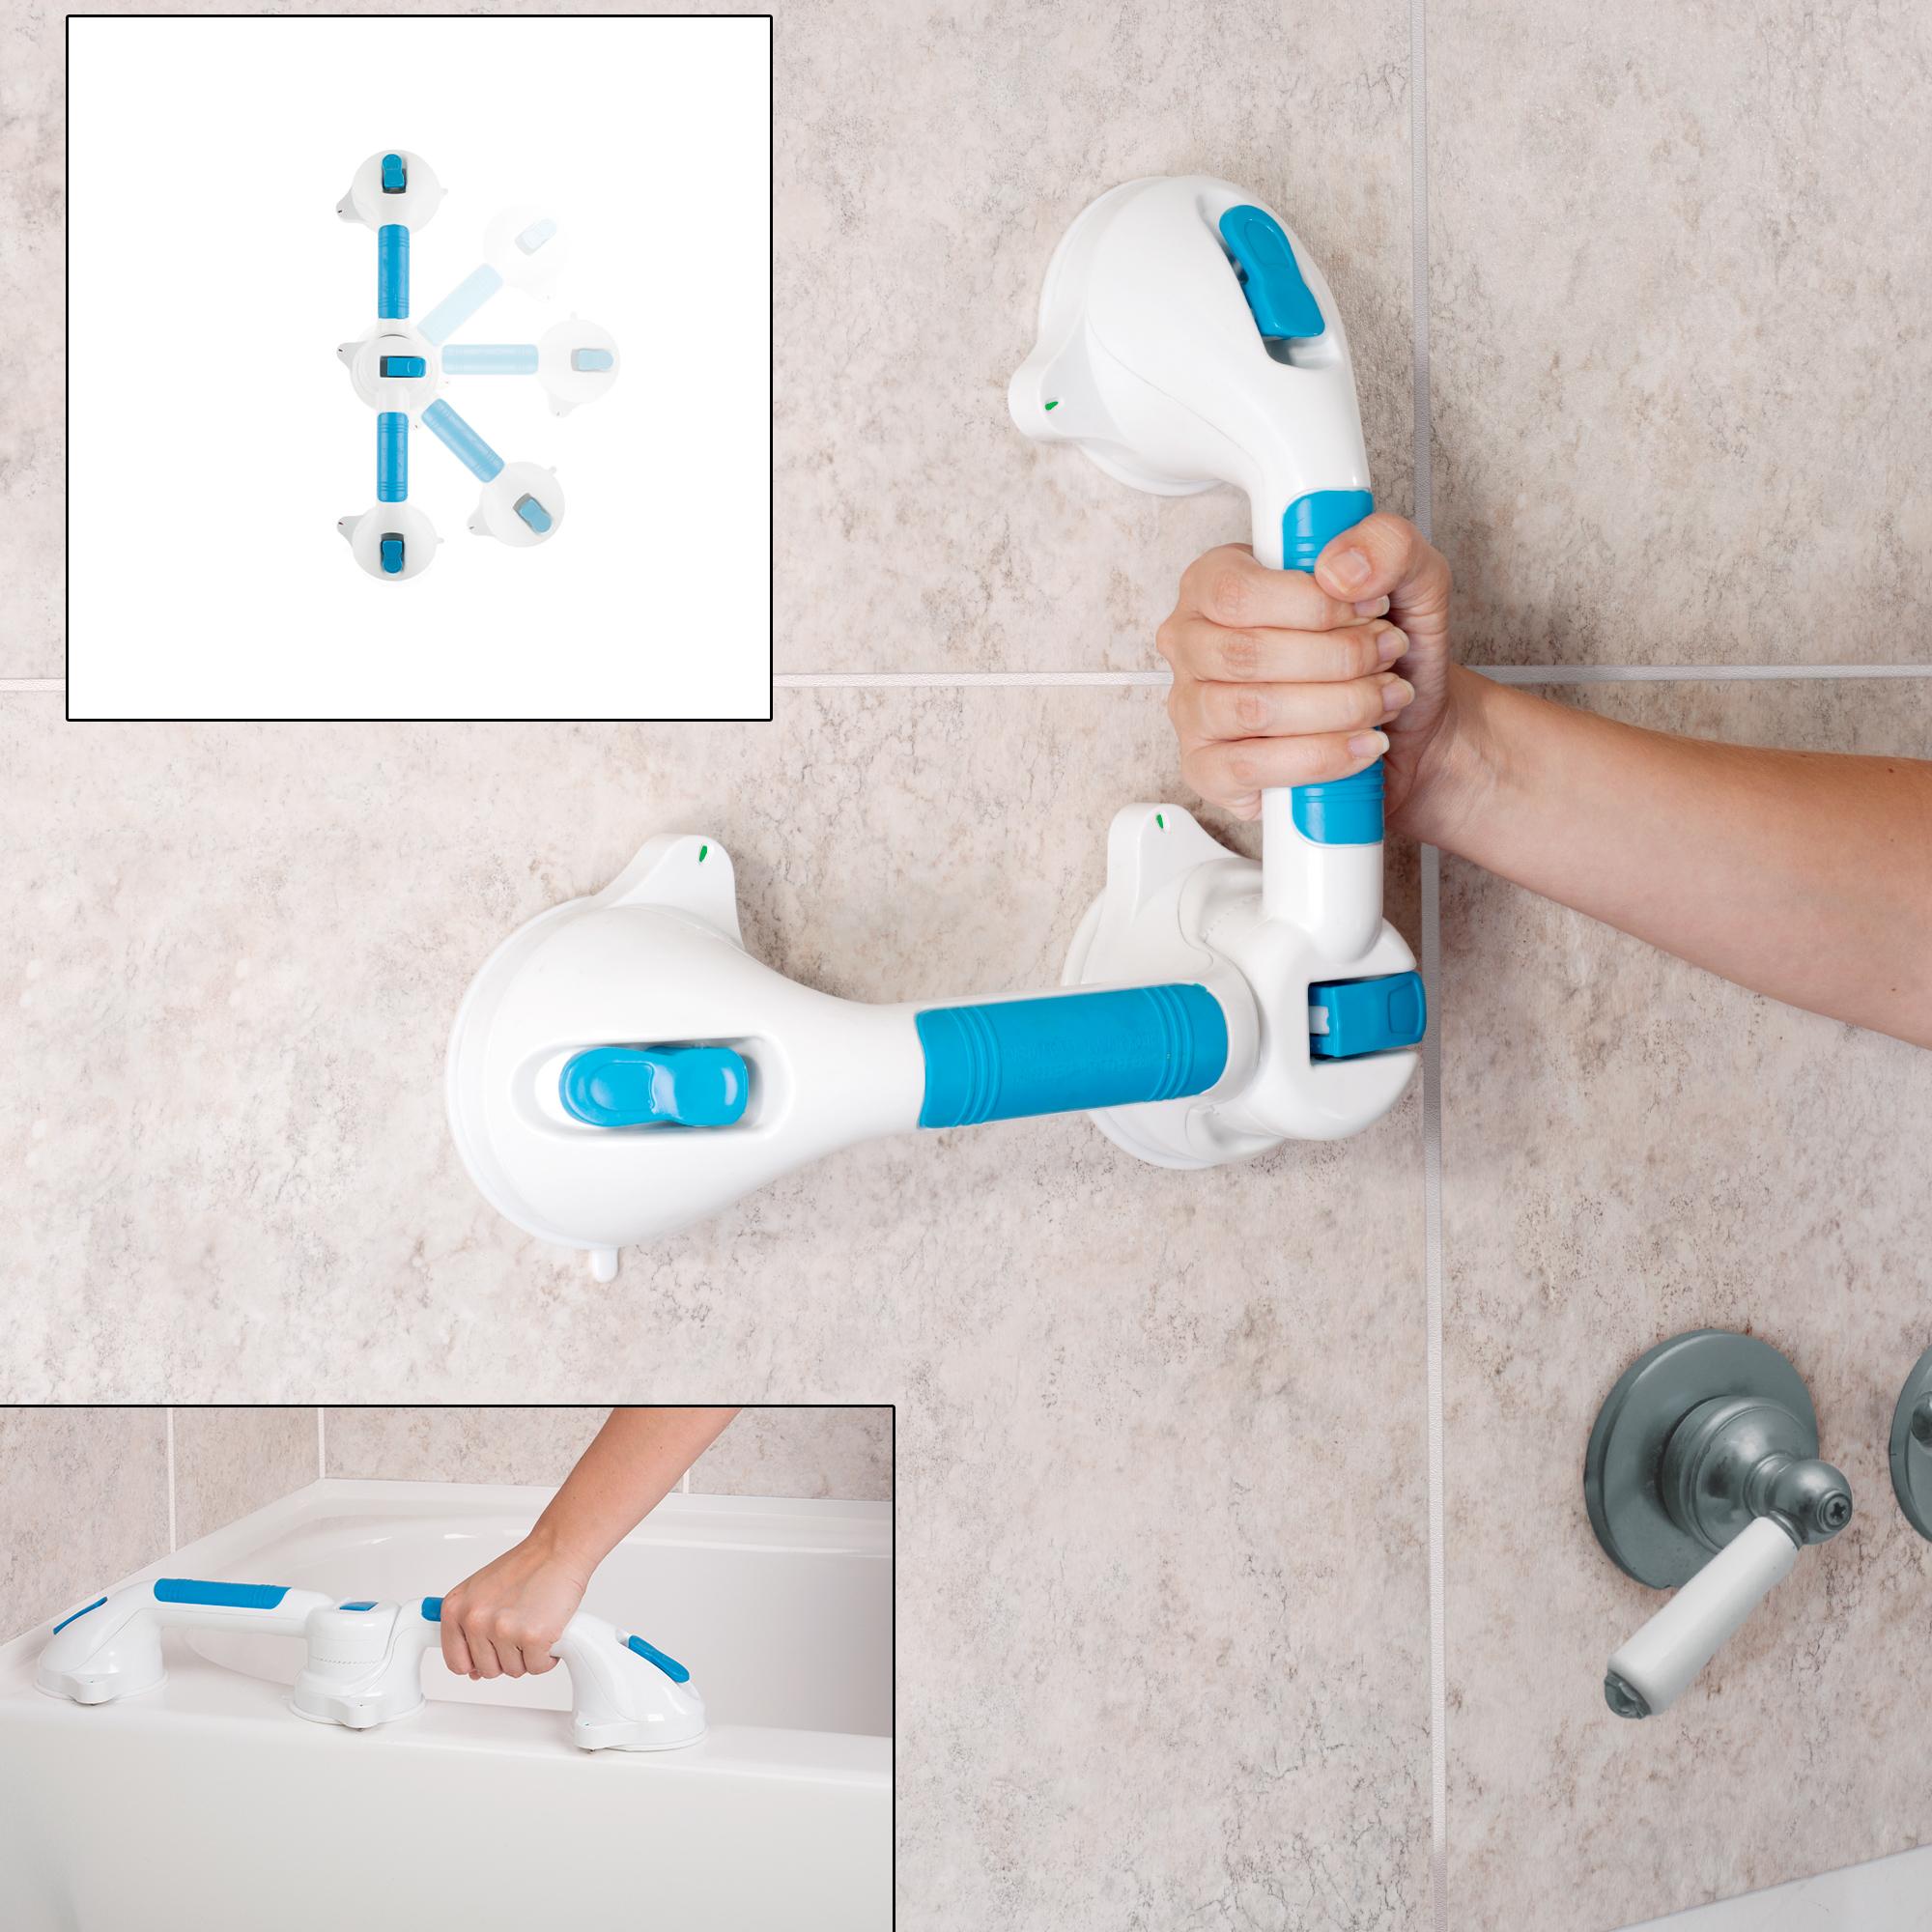 Bluestone Dual Grip Suction Grab Bar 582e0f15e22461457a306622